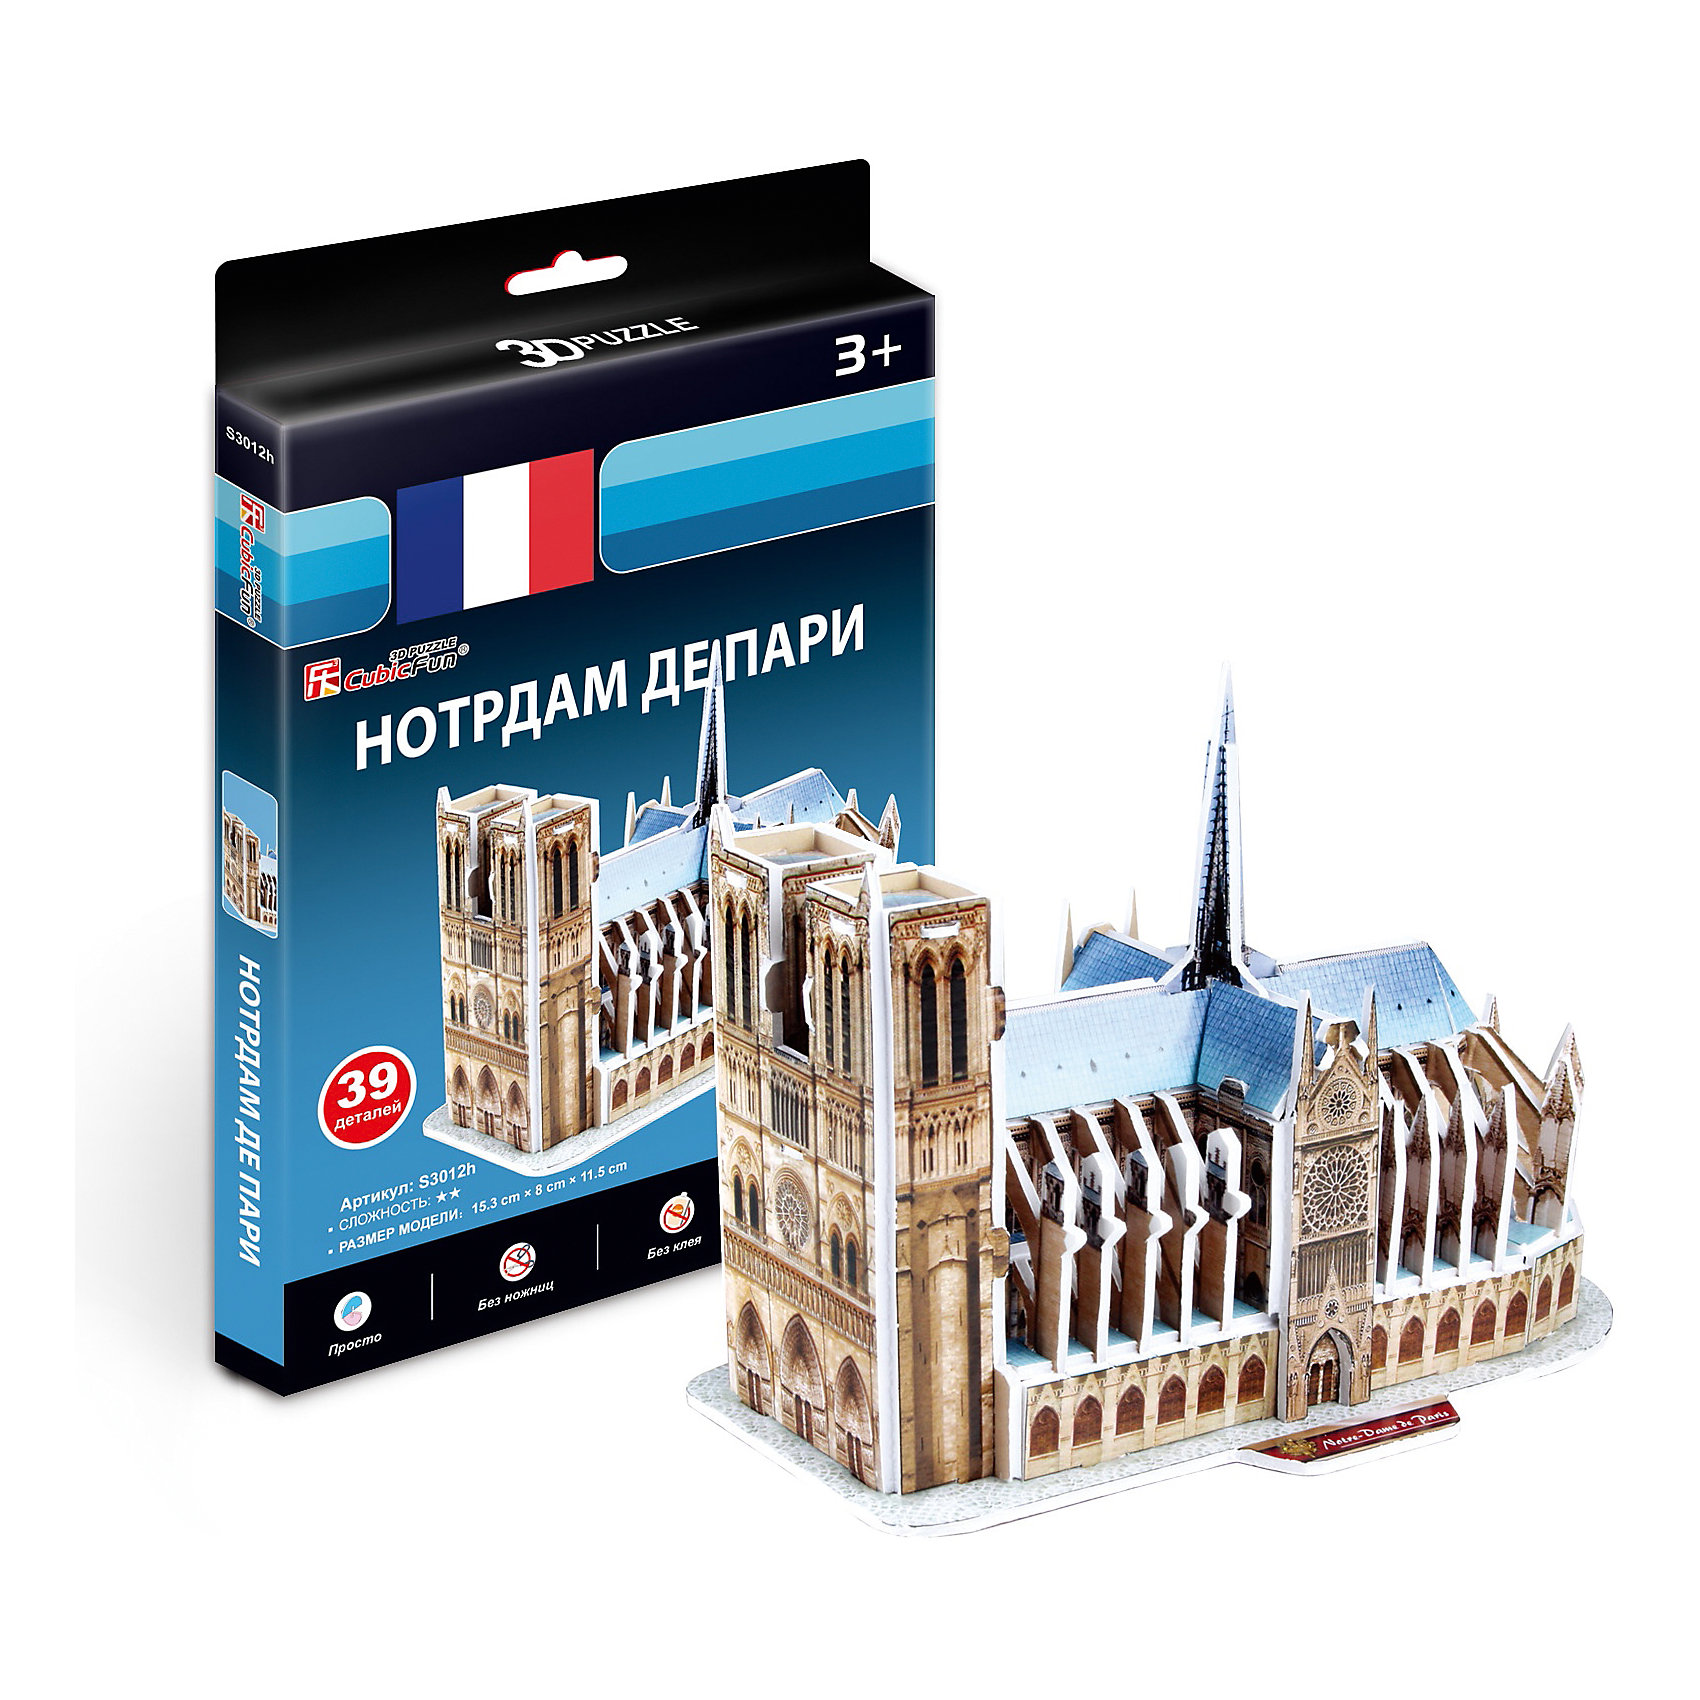 CubicFun Пазл 3D Нотрдам де Пари (Франция), CubicFun конструкторы cubicfun 3d пазл эйфелева башня 2 франция